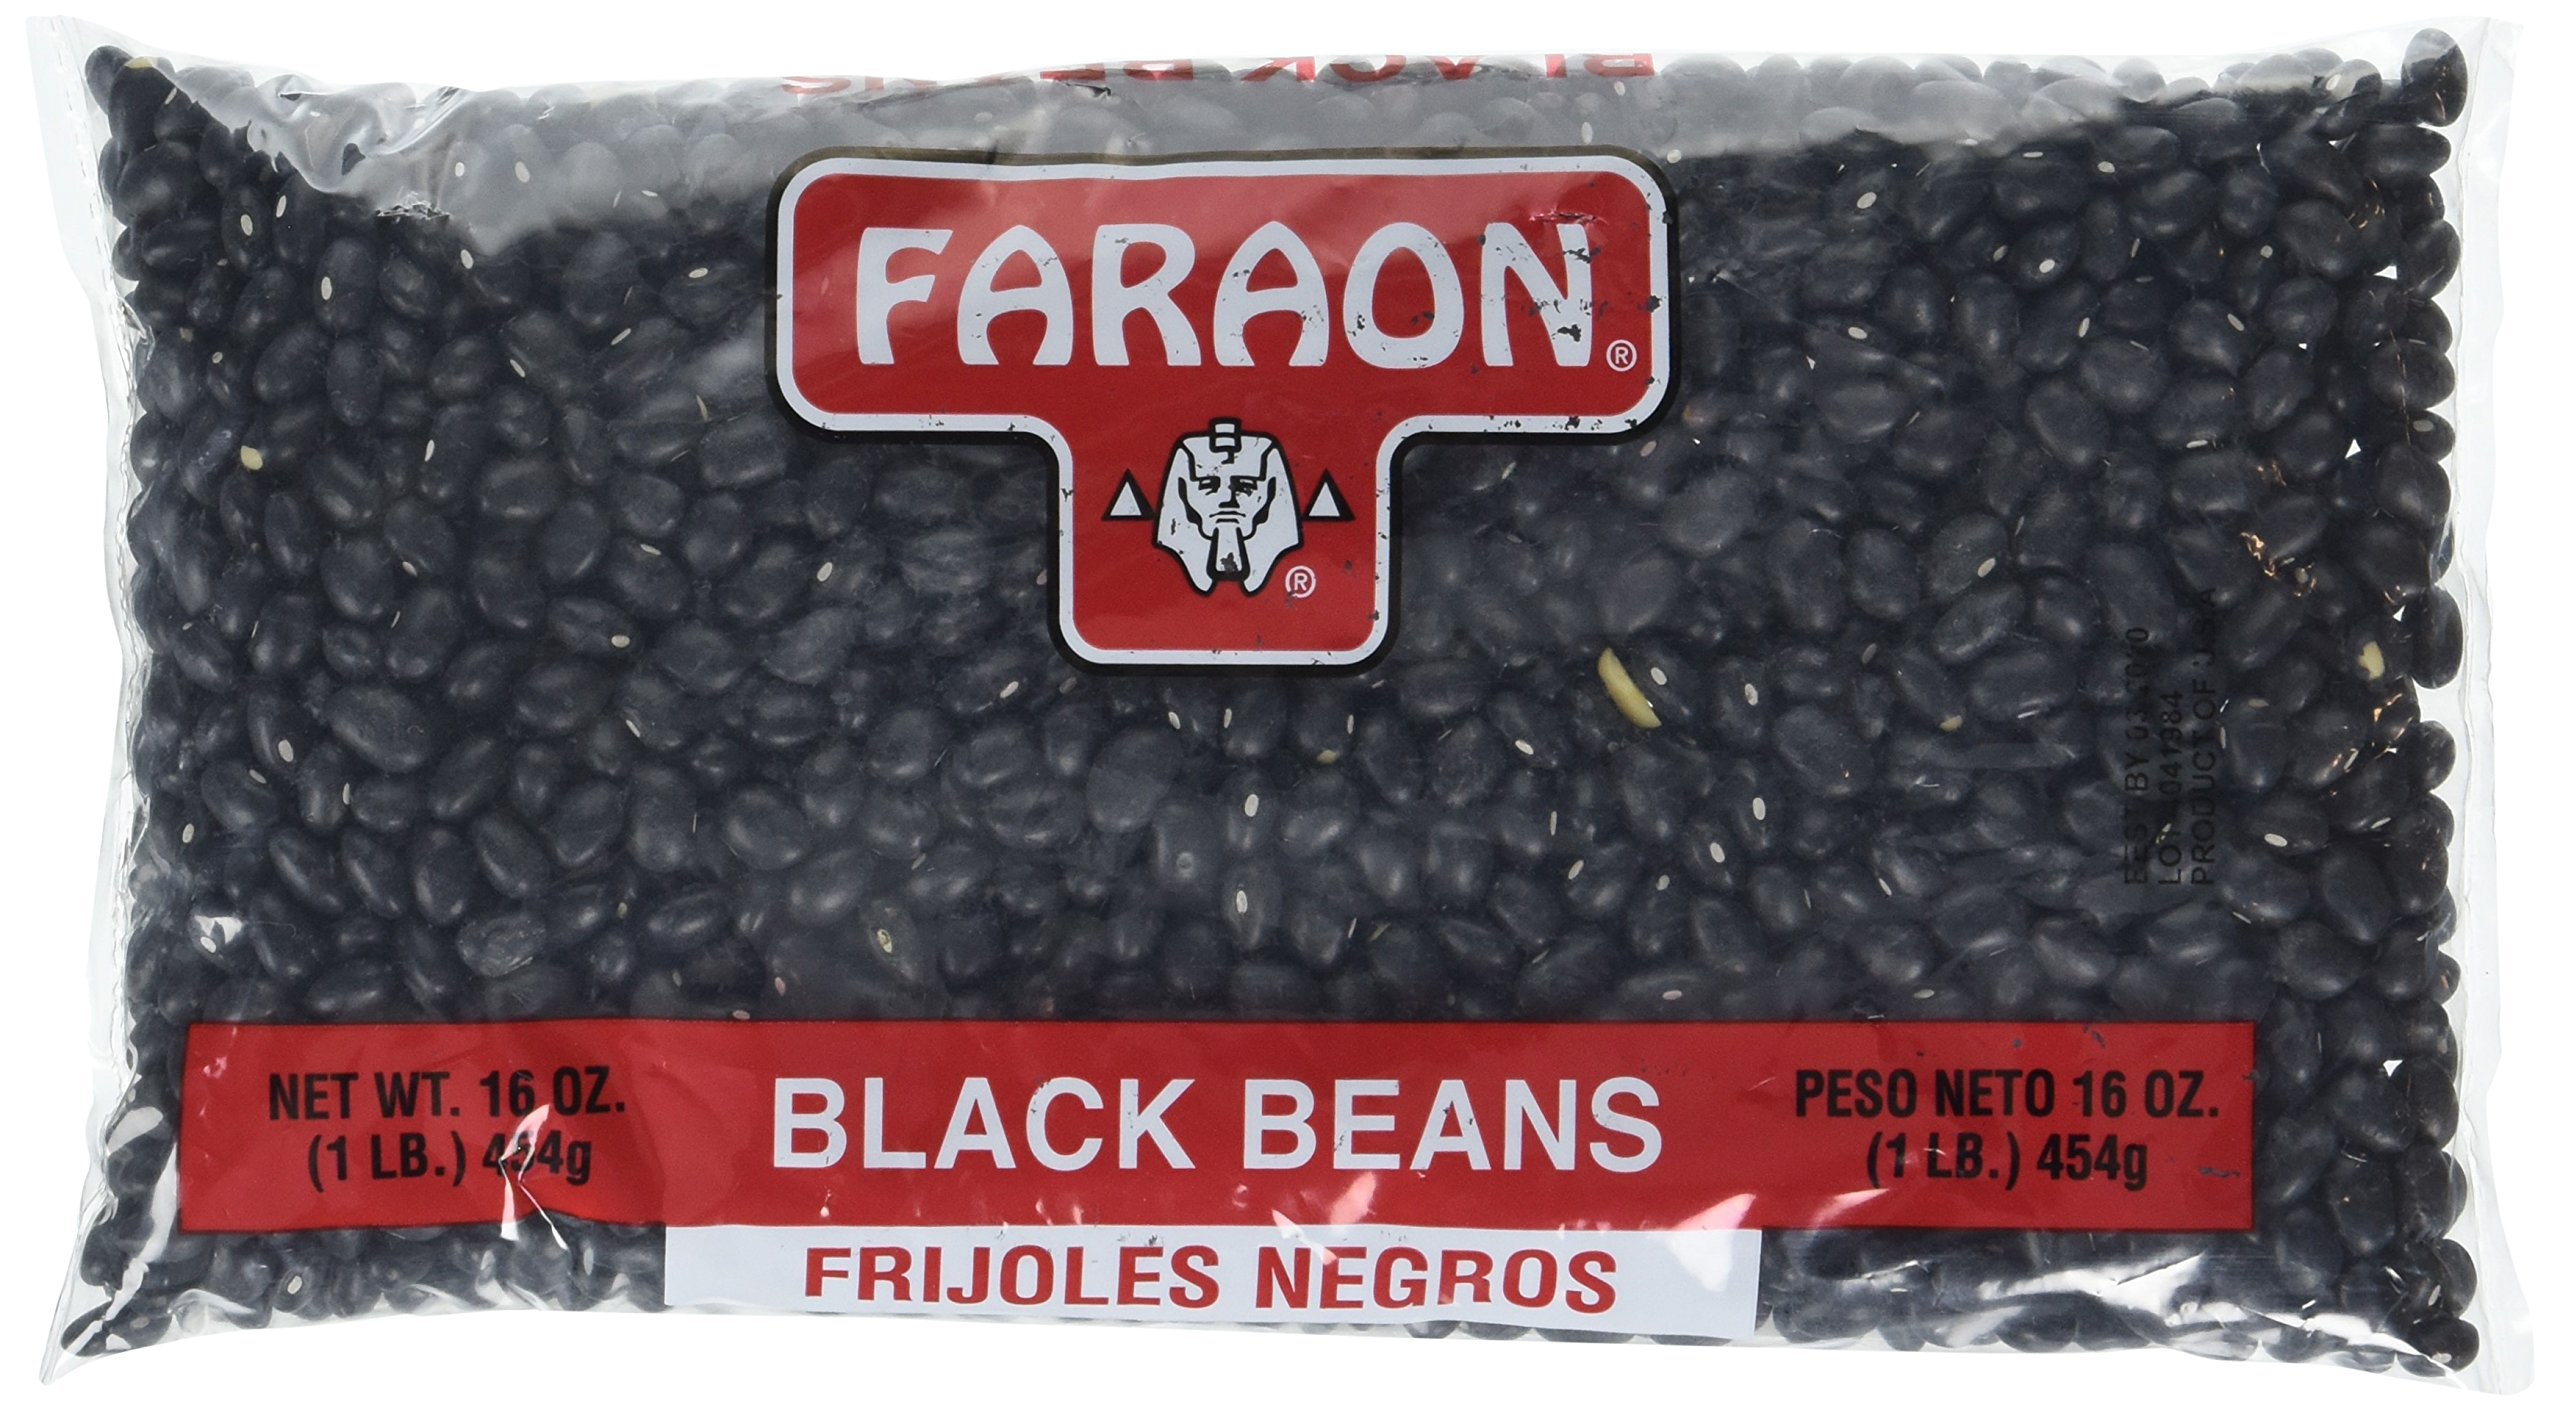 FARAON Black Beans, 1 Pound (Pack of 12) by Faraon (Image #1)